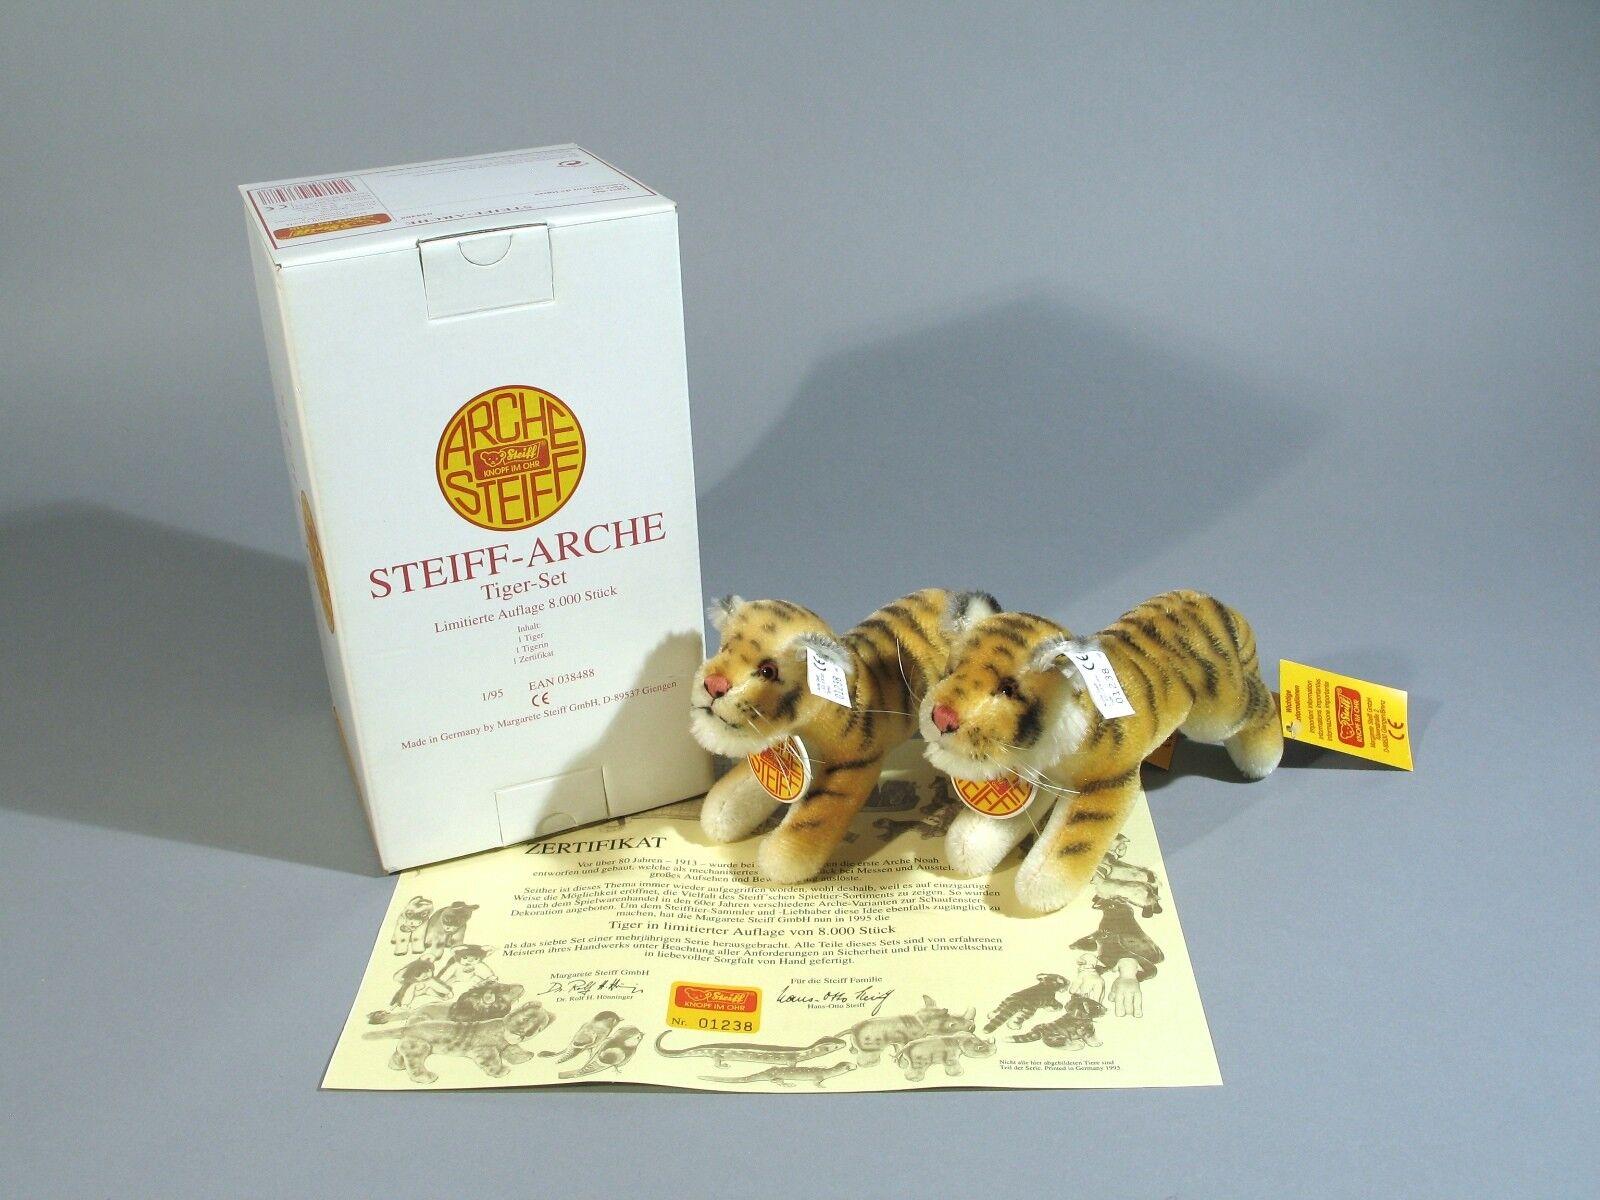 Steiff Arche Ark Tiger Tiger Set 038488 KFS Waschanleitung Zertifikat OVP